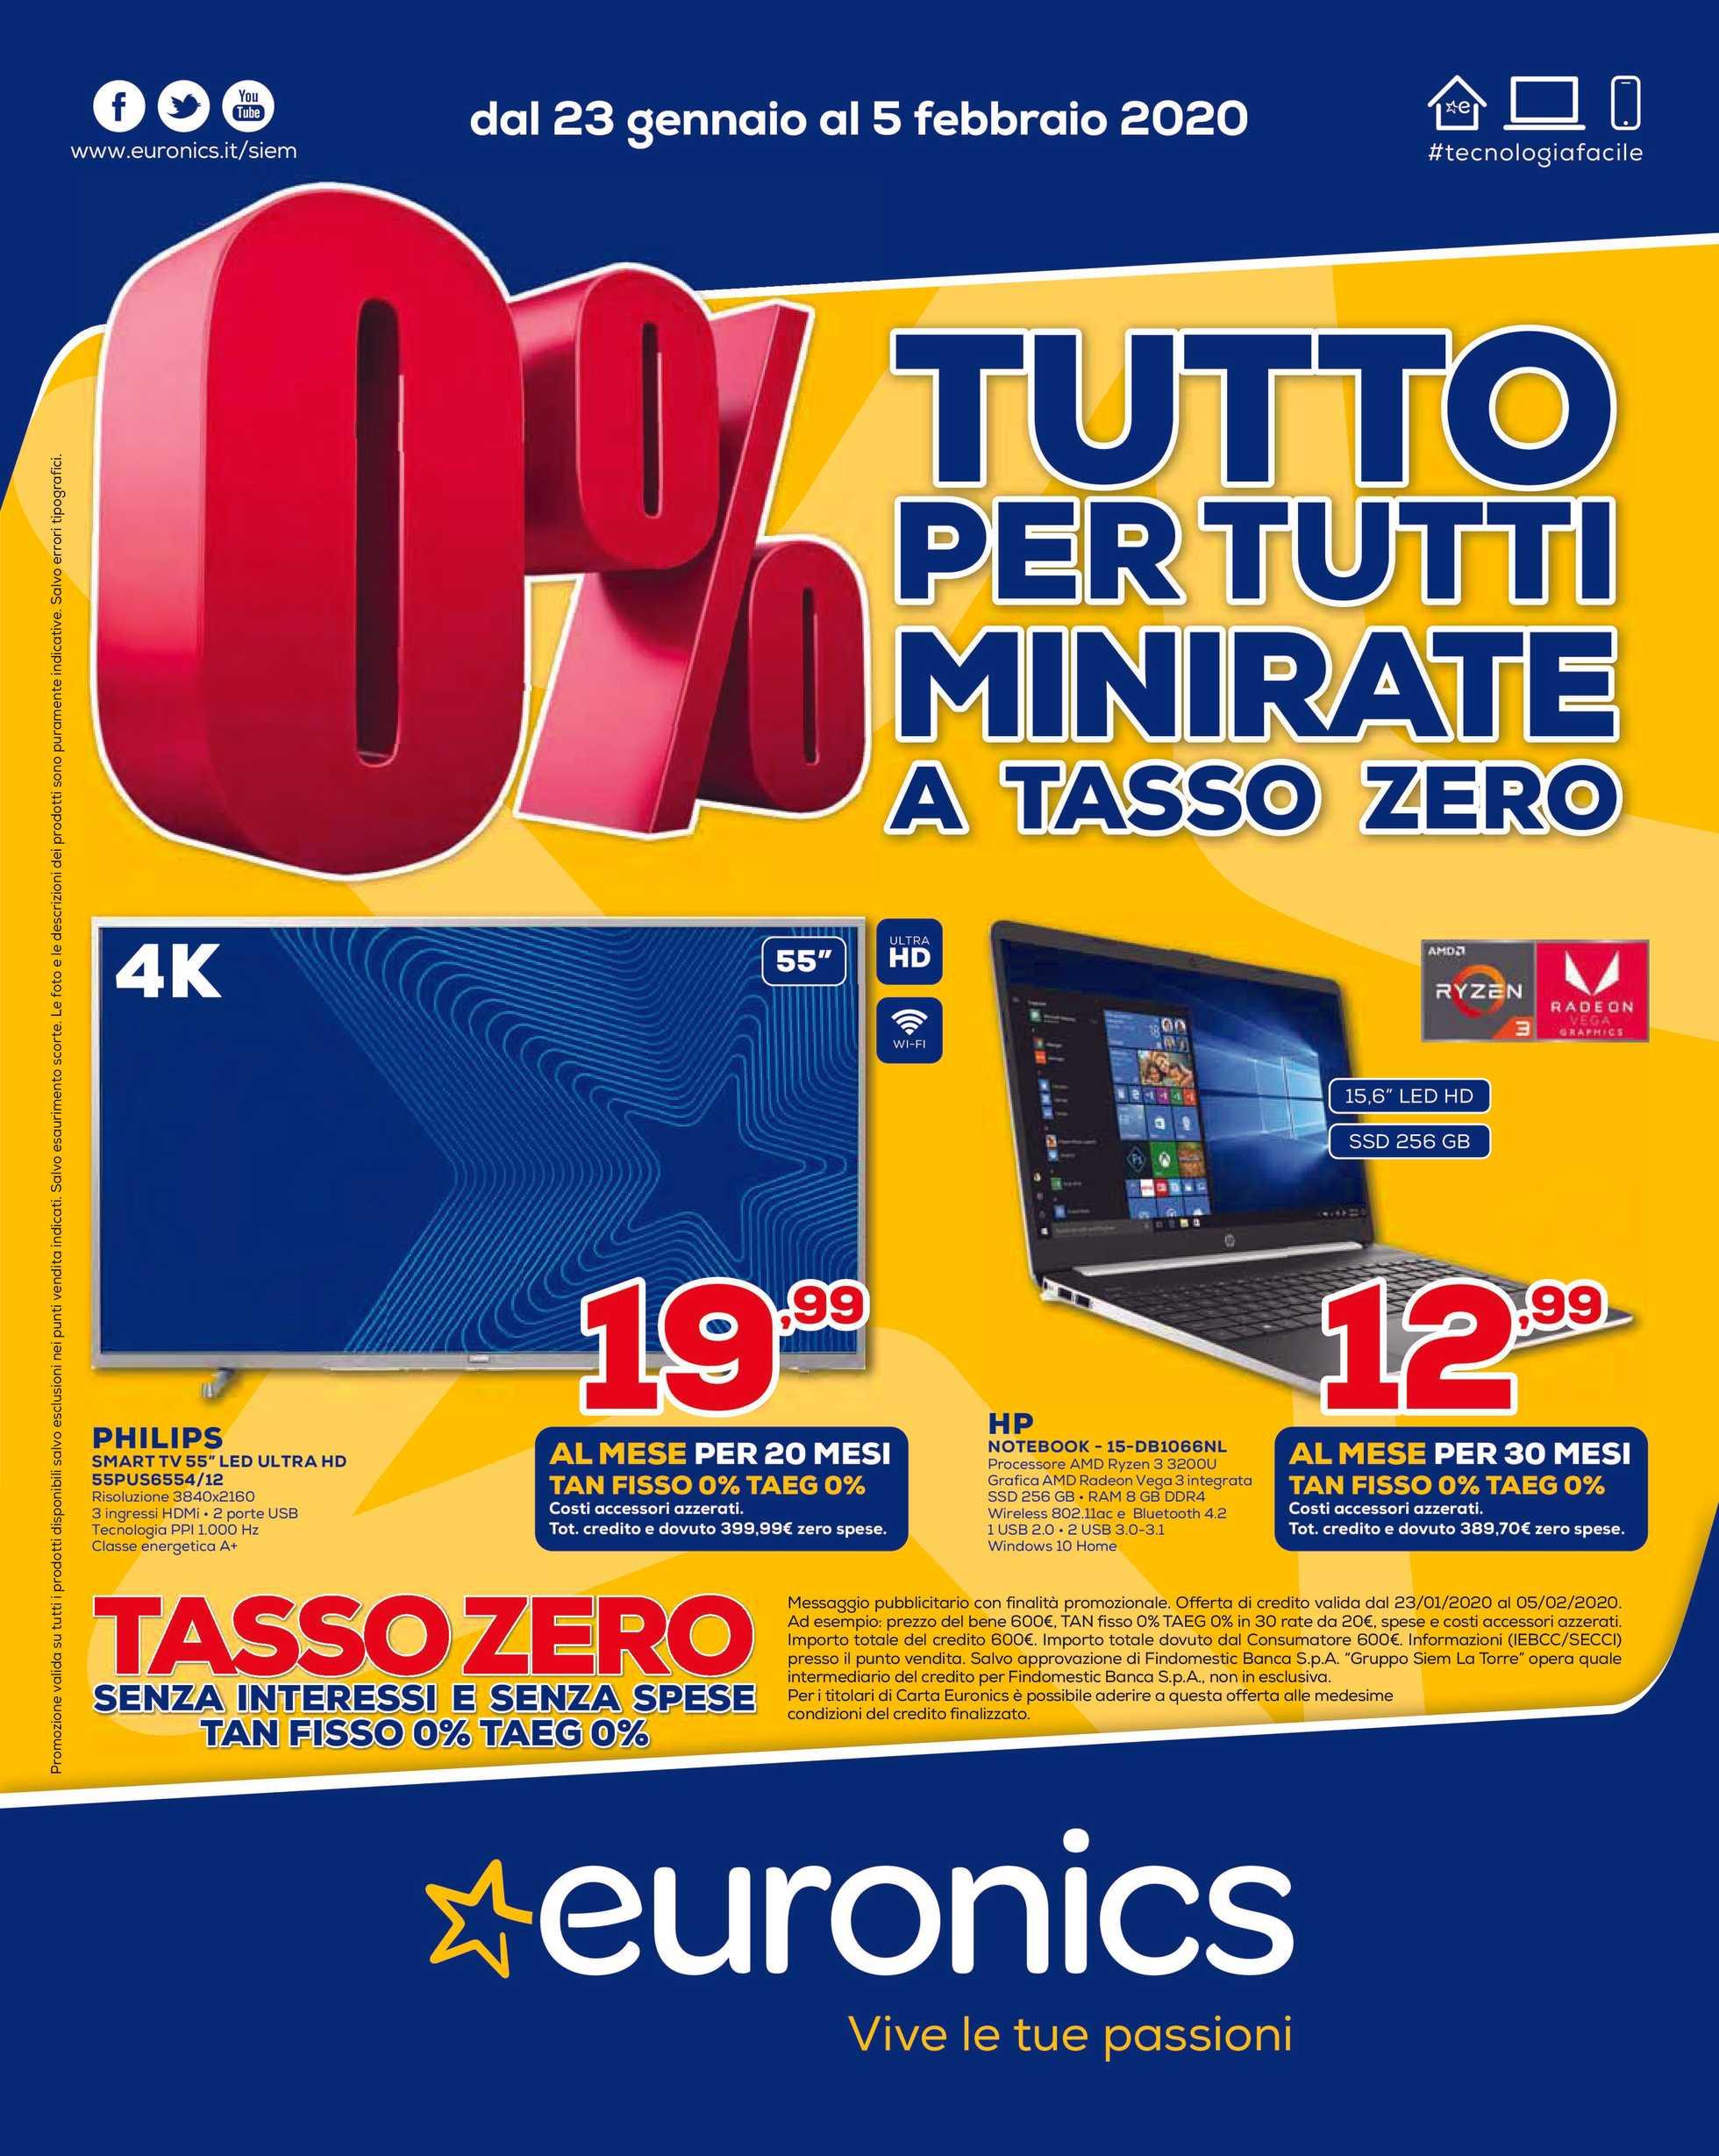 Volantino Euronics   Le ultime offerte   it.promotons.com